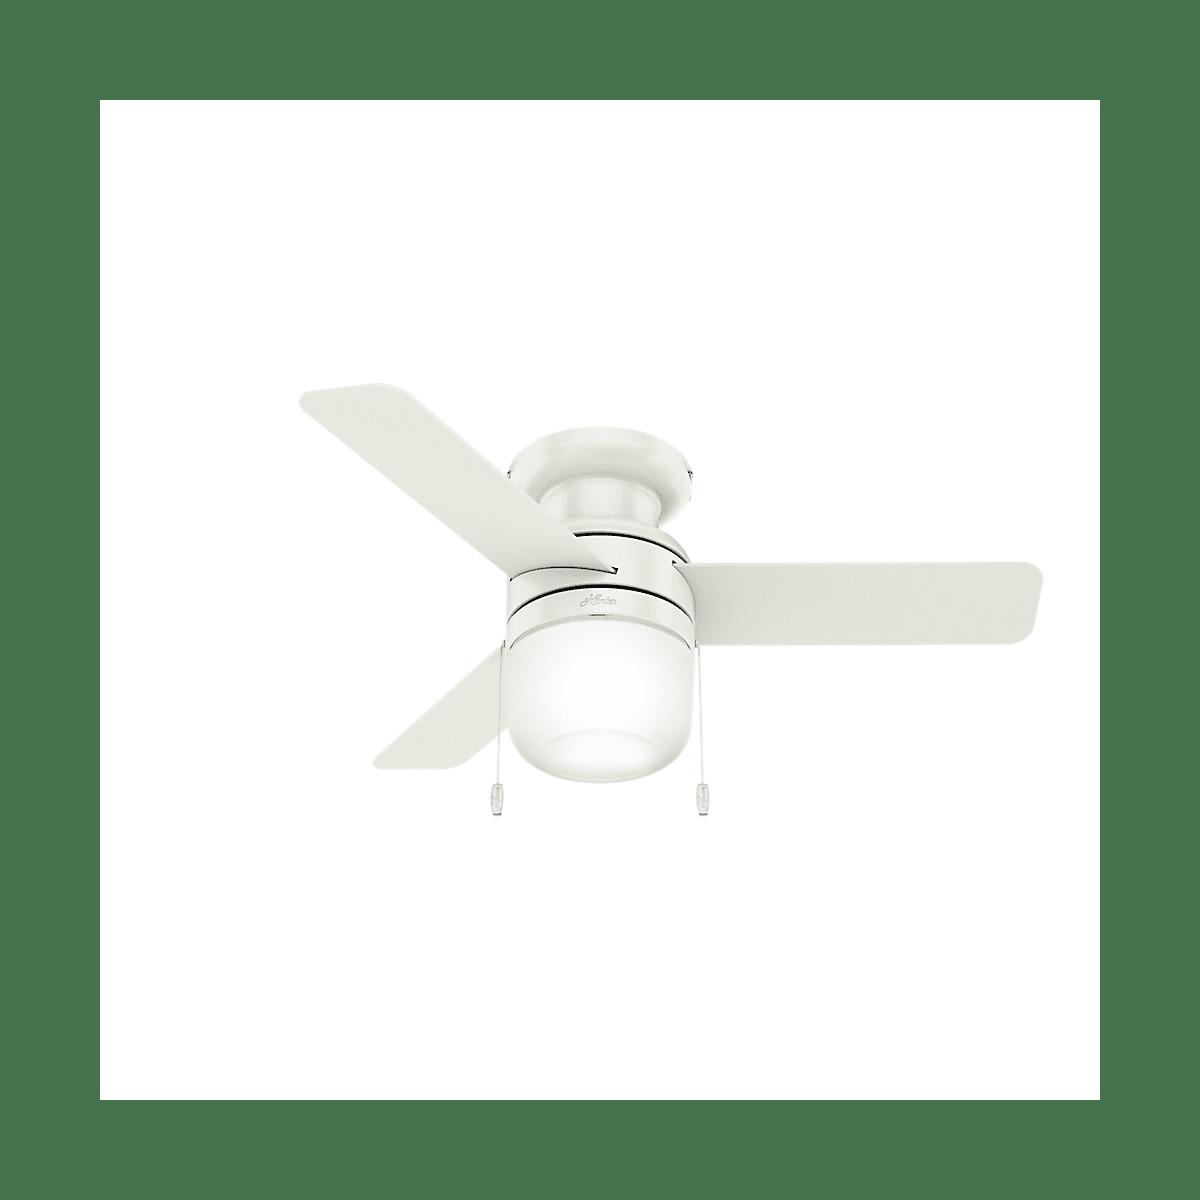 Hunter 59464 Fresh White Acumen 42 3 Blade Hugger Indoor Ceiling Fan With Blades And Led Light Kit Faucet Com